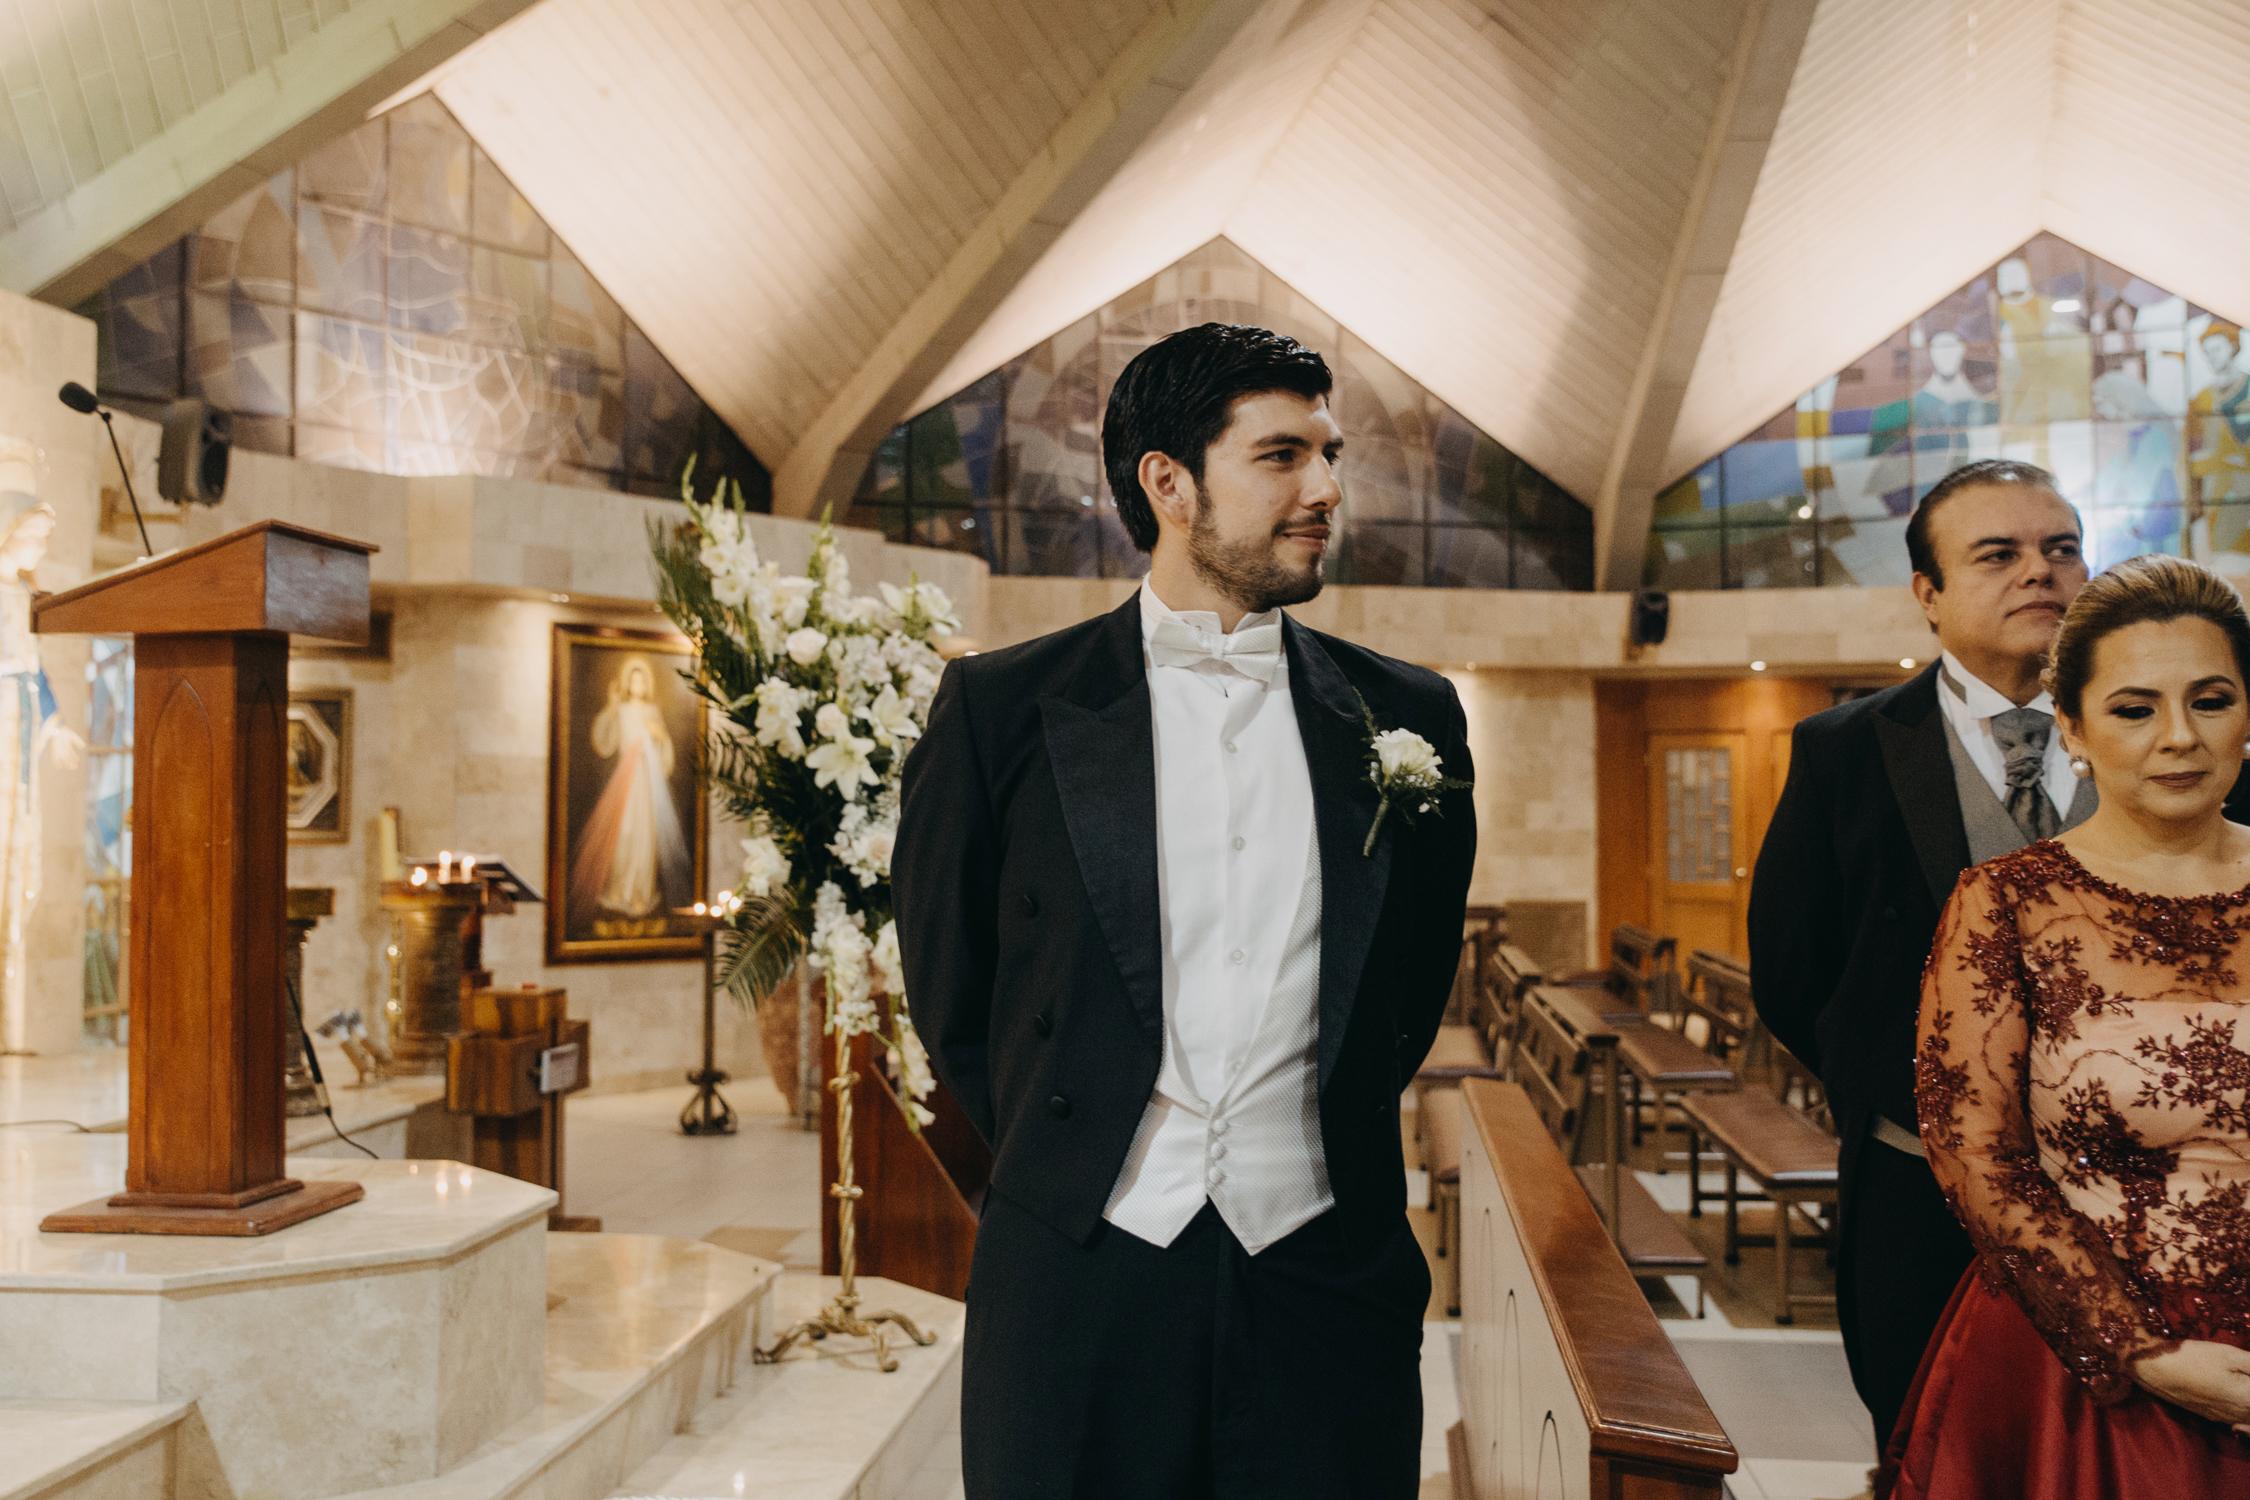 Michelle-Agurto-Fotografia-Bodas-Ecuador-Destination-Wedding-Photographer-Vicky-Javier-49.JPG